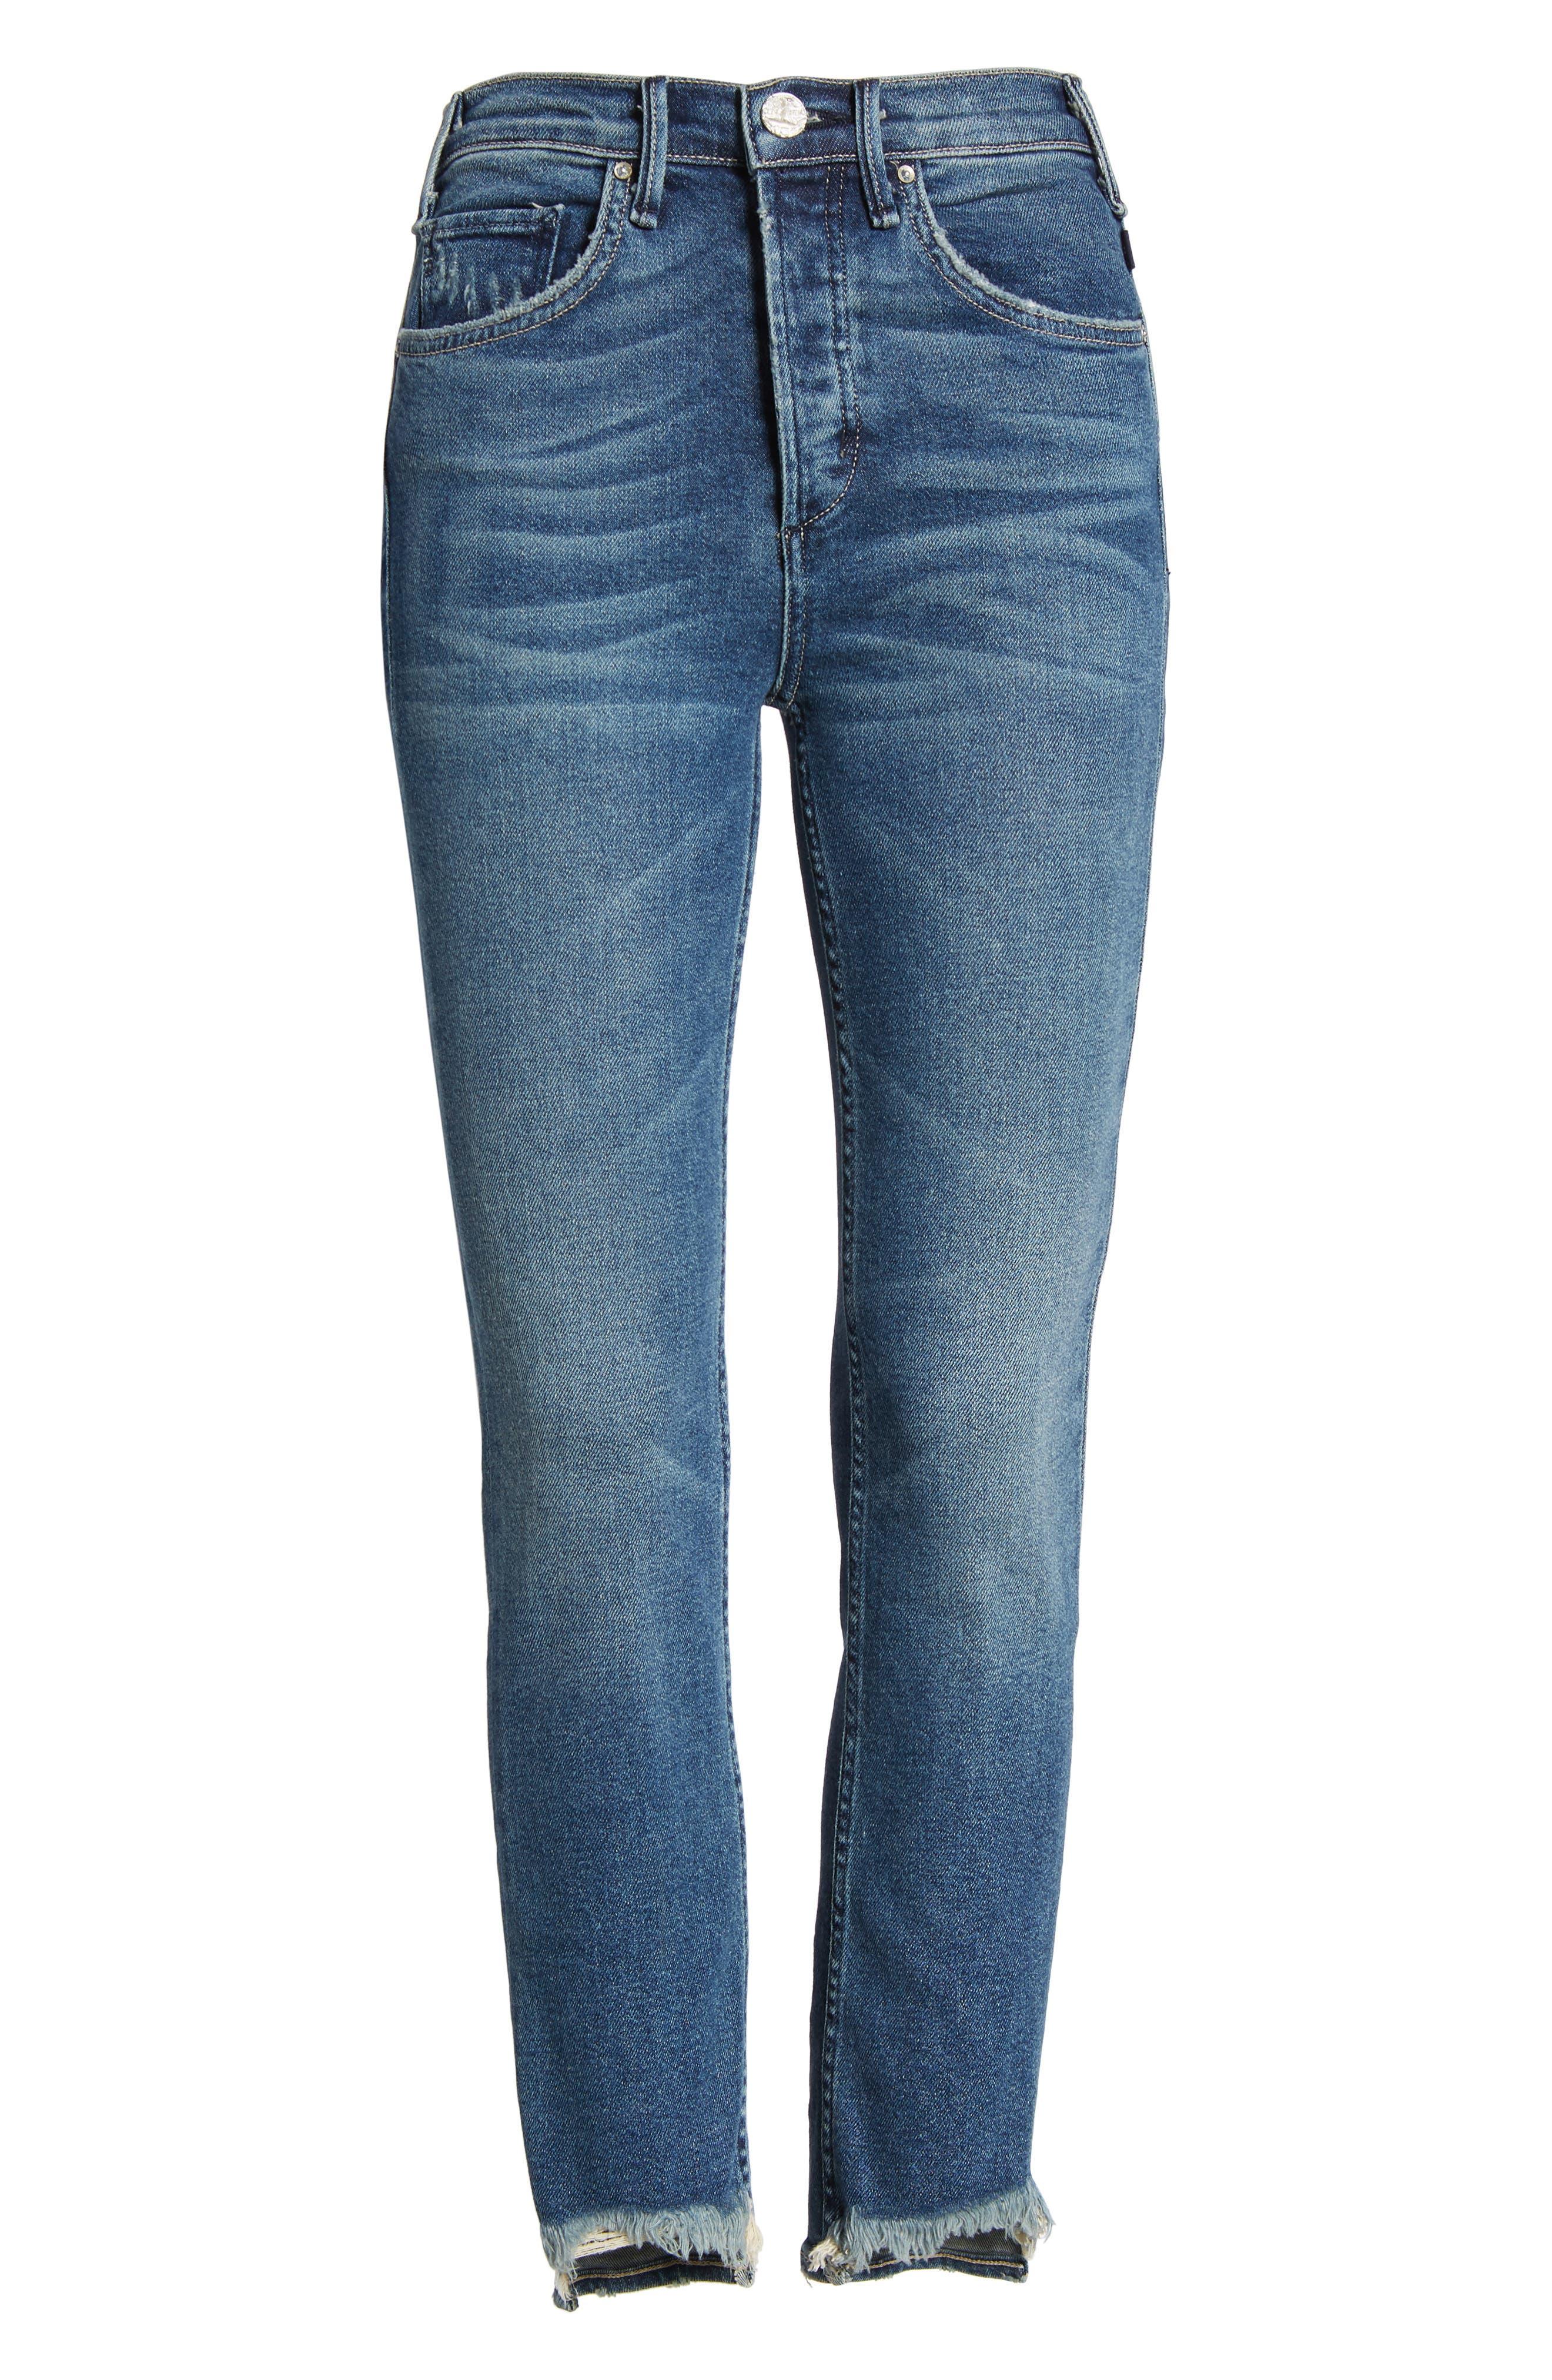 Valetta High Waist Crop Straight Leg Jeans,                             Alternate thumbnail 7, color,                             WAY UP NORTH